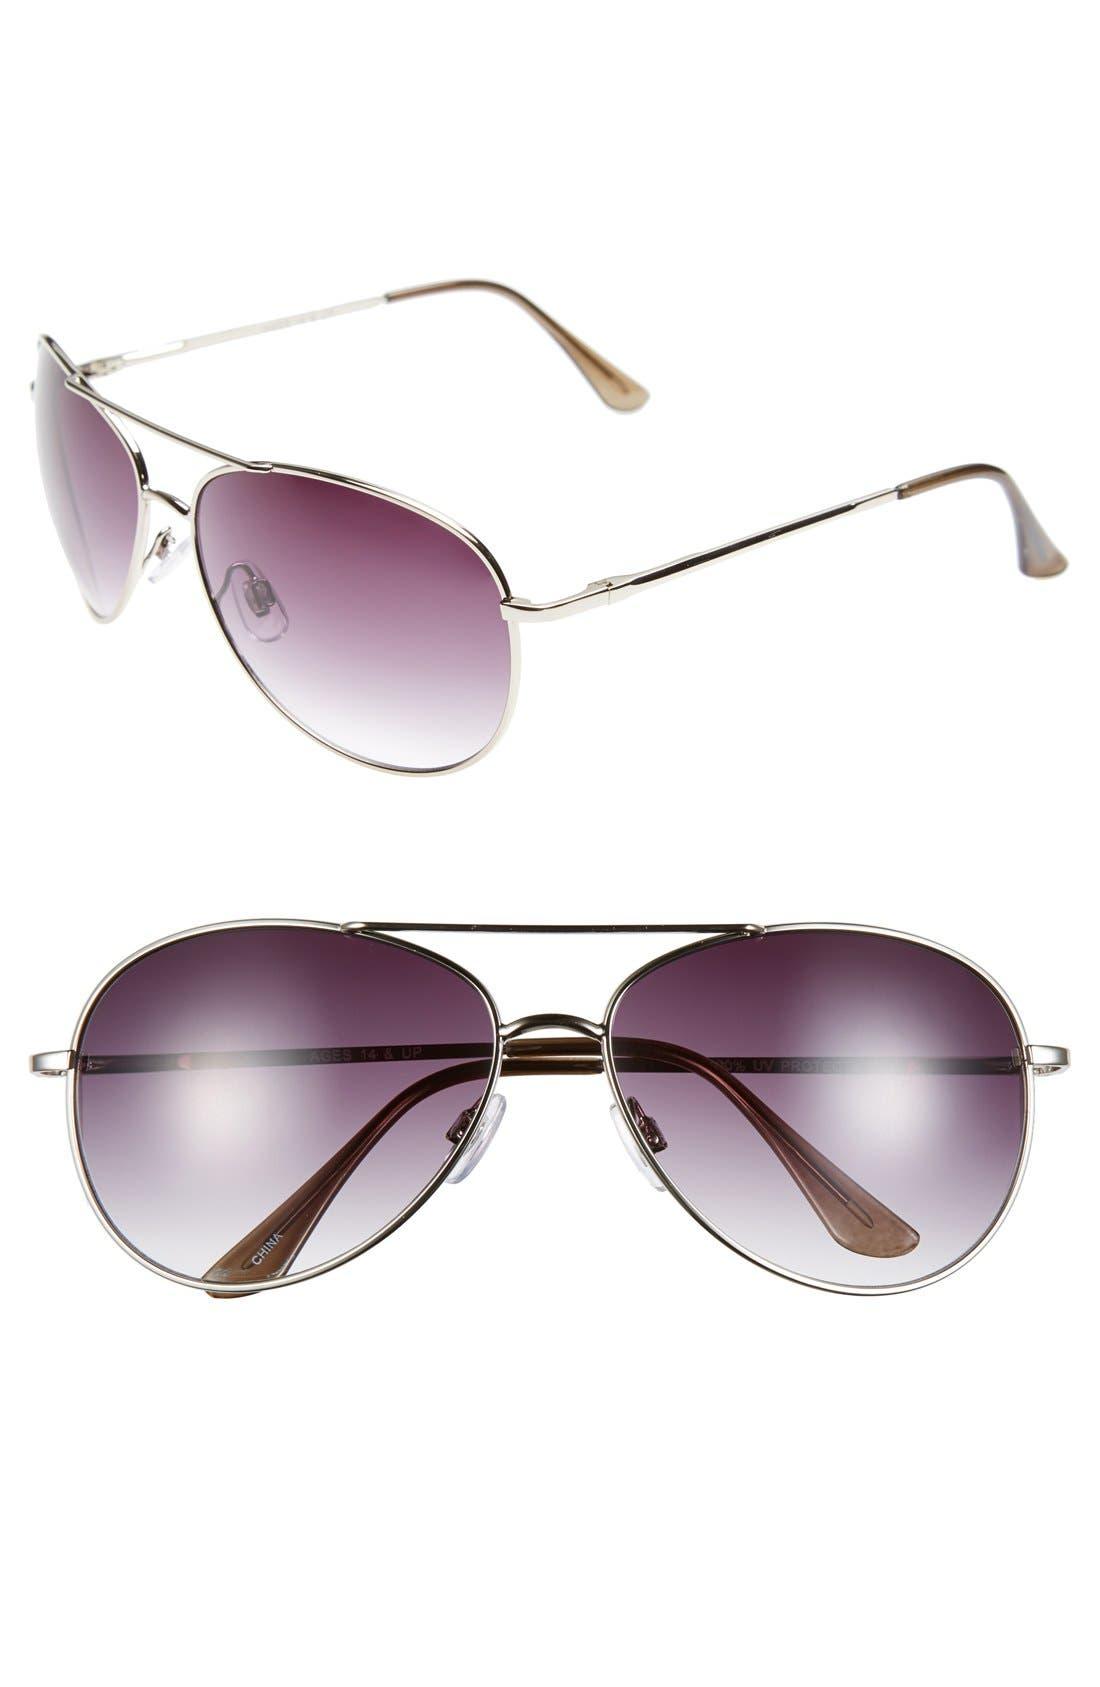 FANTASEYES Fantas Eyes Aviator 60mm Sunglasses, Main, color, 040